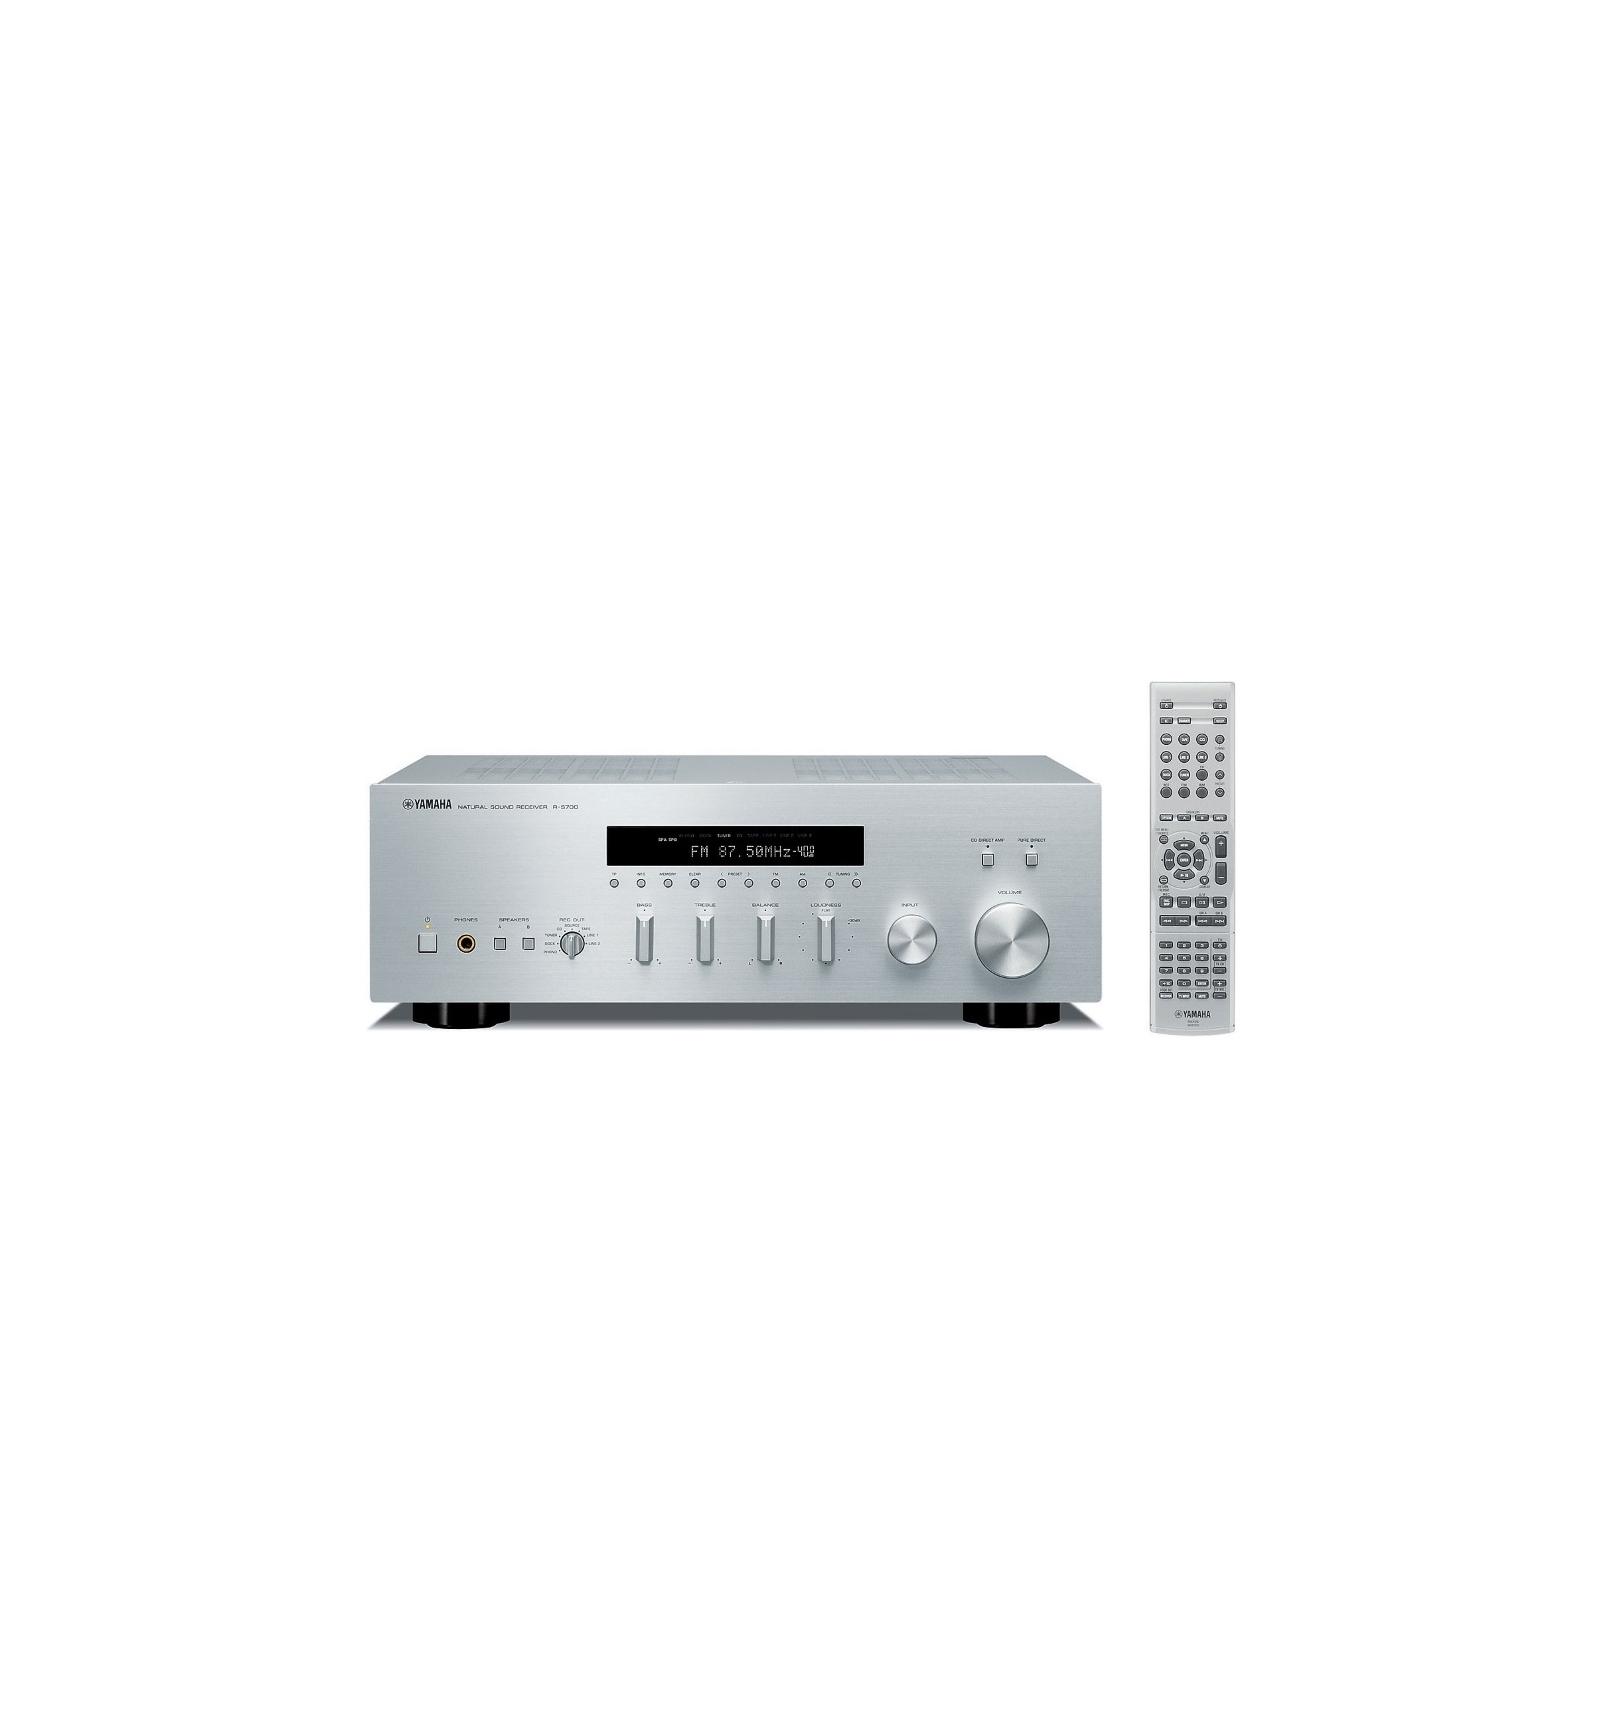 yamaha r s700 natural sound stereo receiver camaross